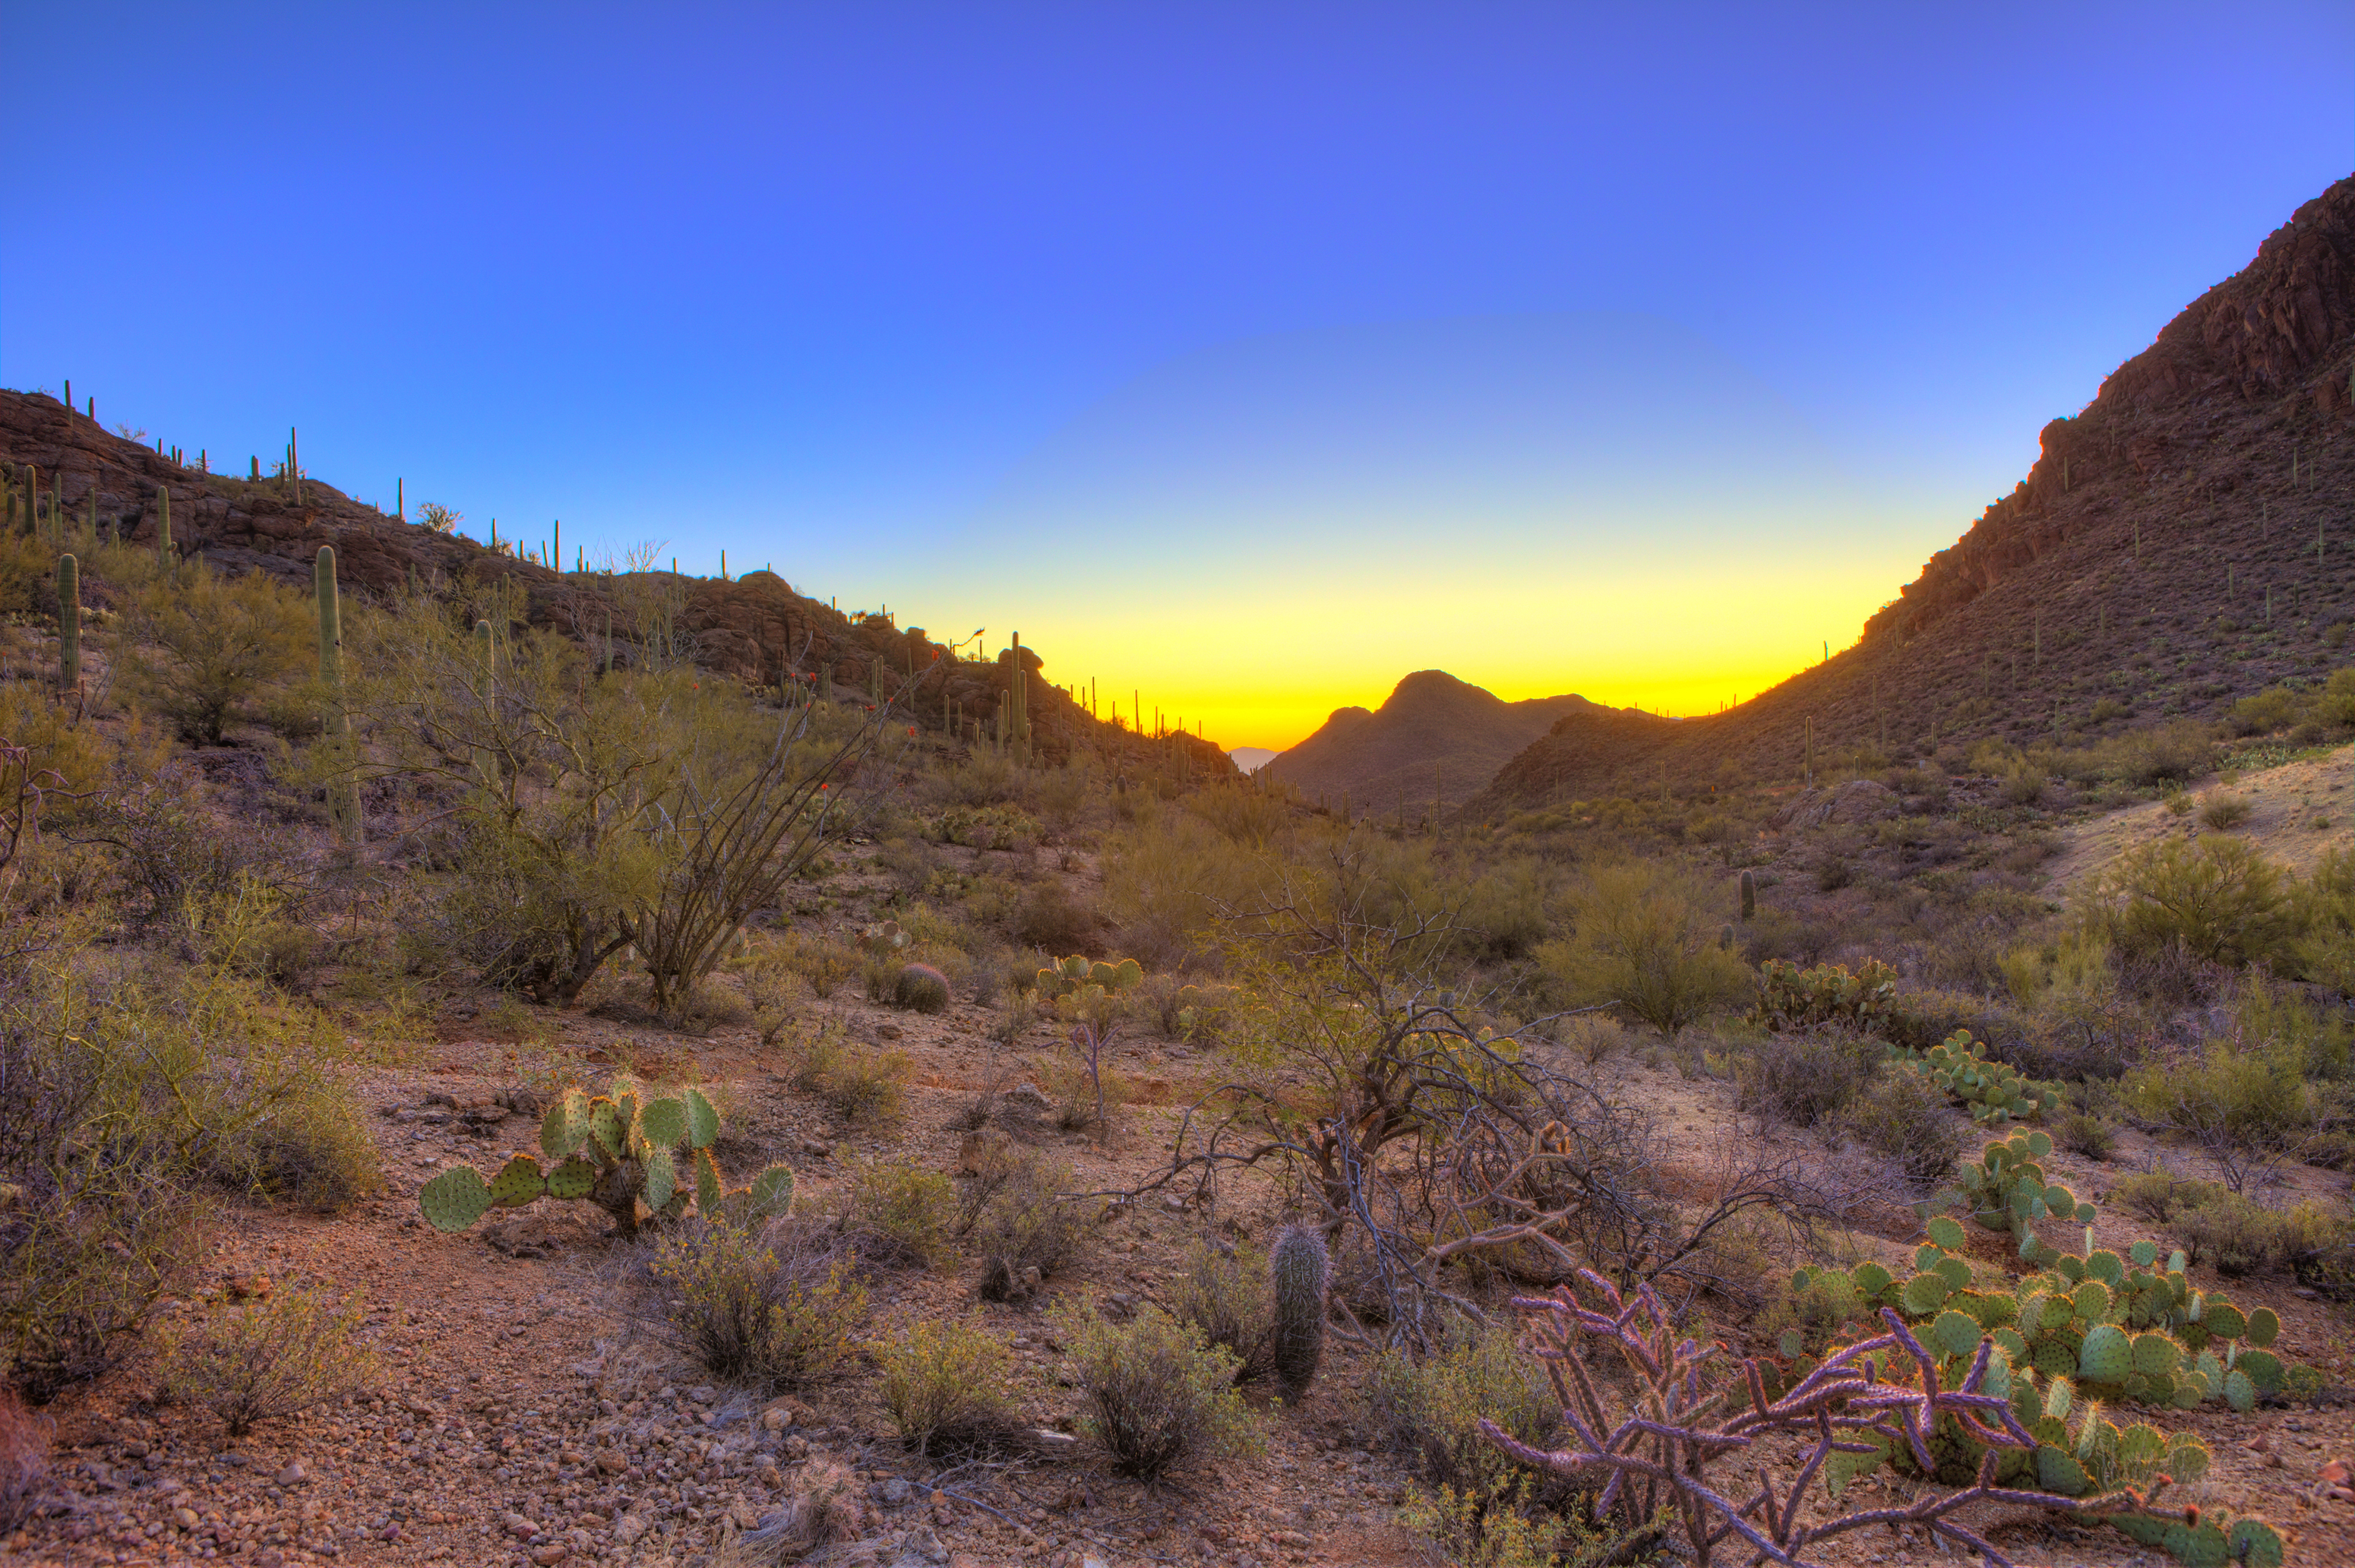 sunrise over the sonoran desert in arizona, hdr image.jpg